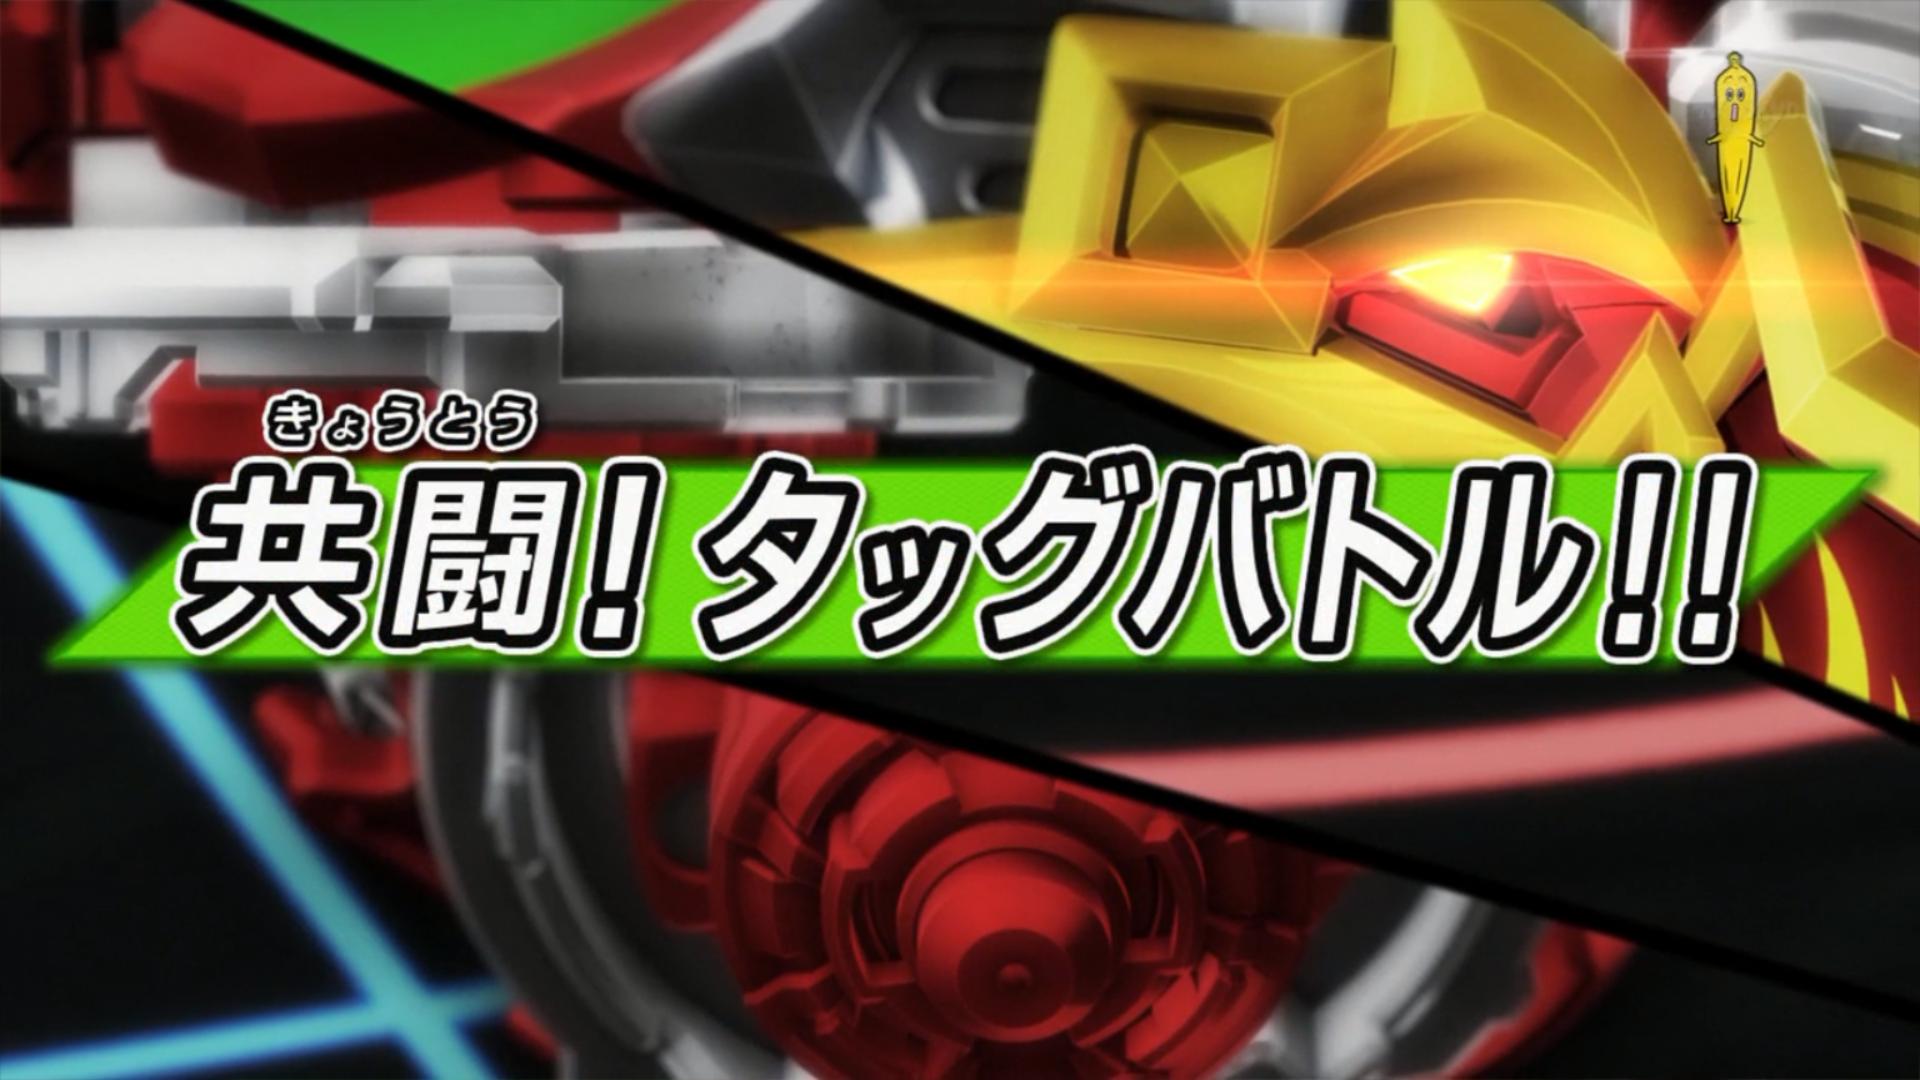 Beyblade Burst Turbo - Episode 21 | Beyblade Wiki | FANDOM ...